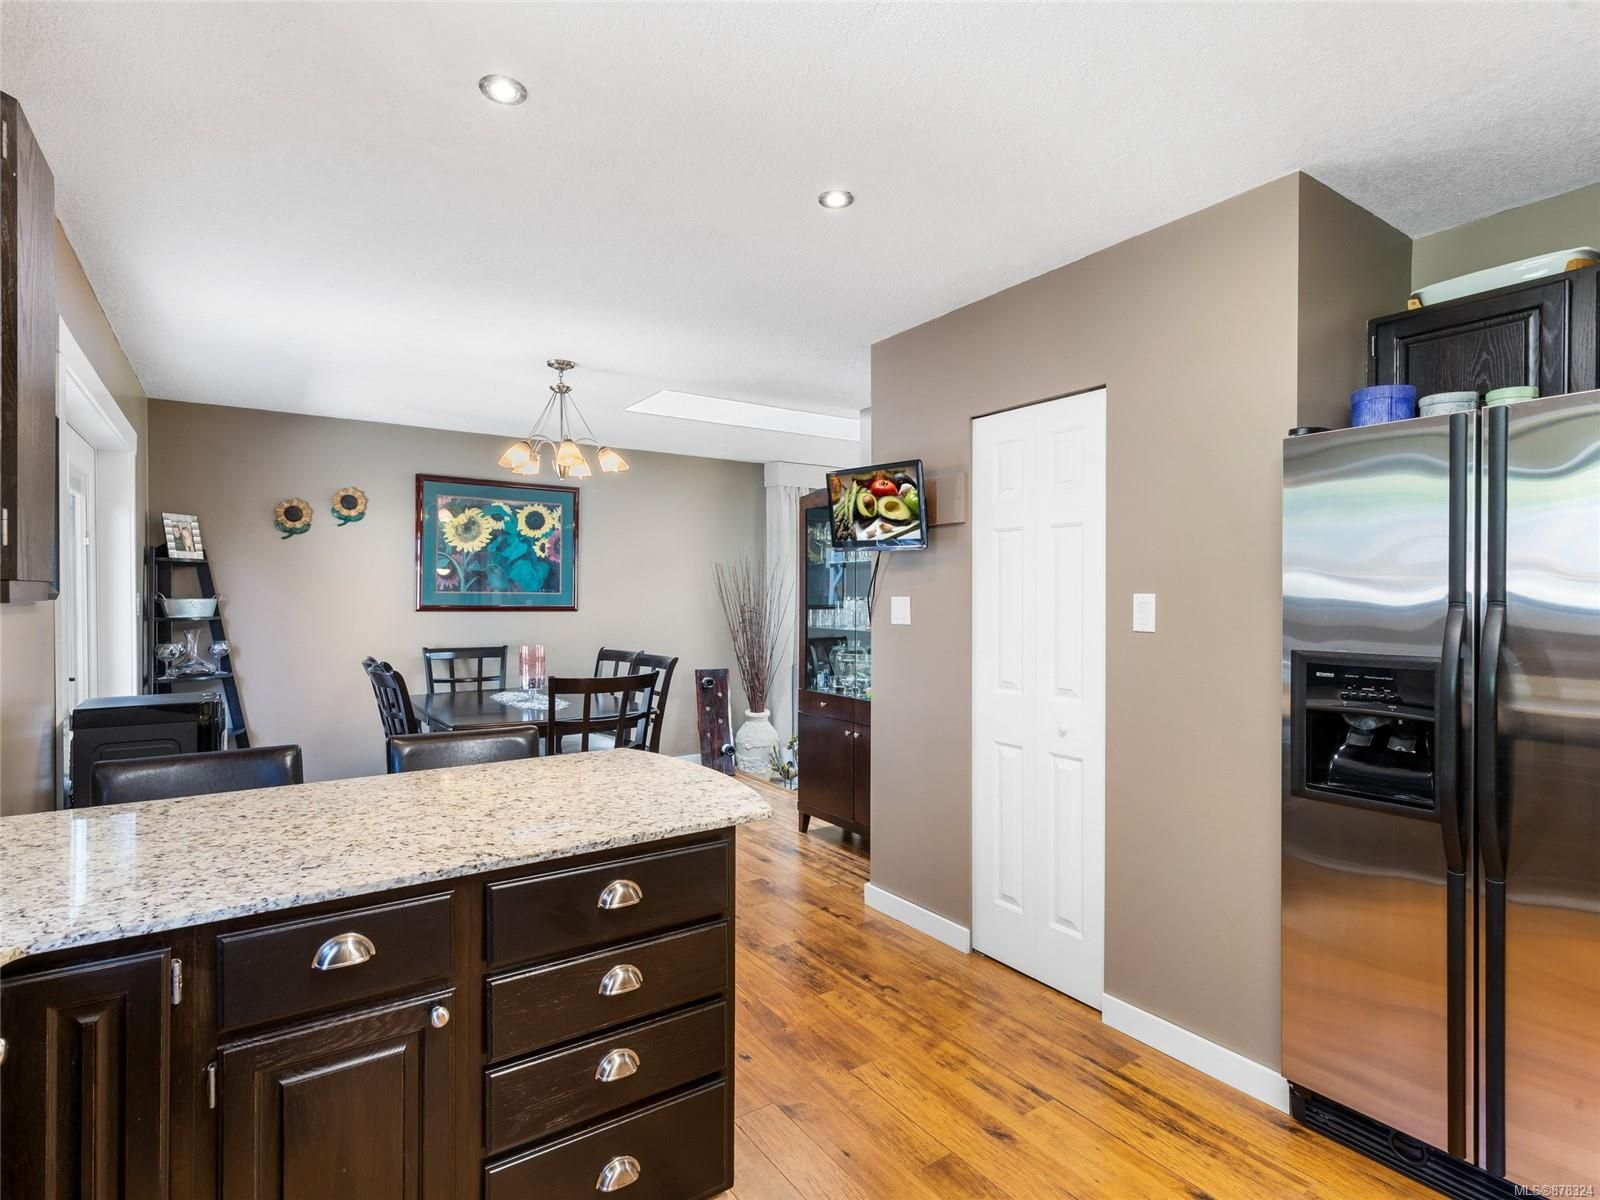 Photo 21: Photos: 3875 Moore Rd in : PA Port Alberni House for sale (Port Alberni)  : MLS®# 878324